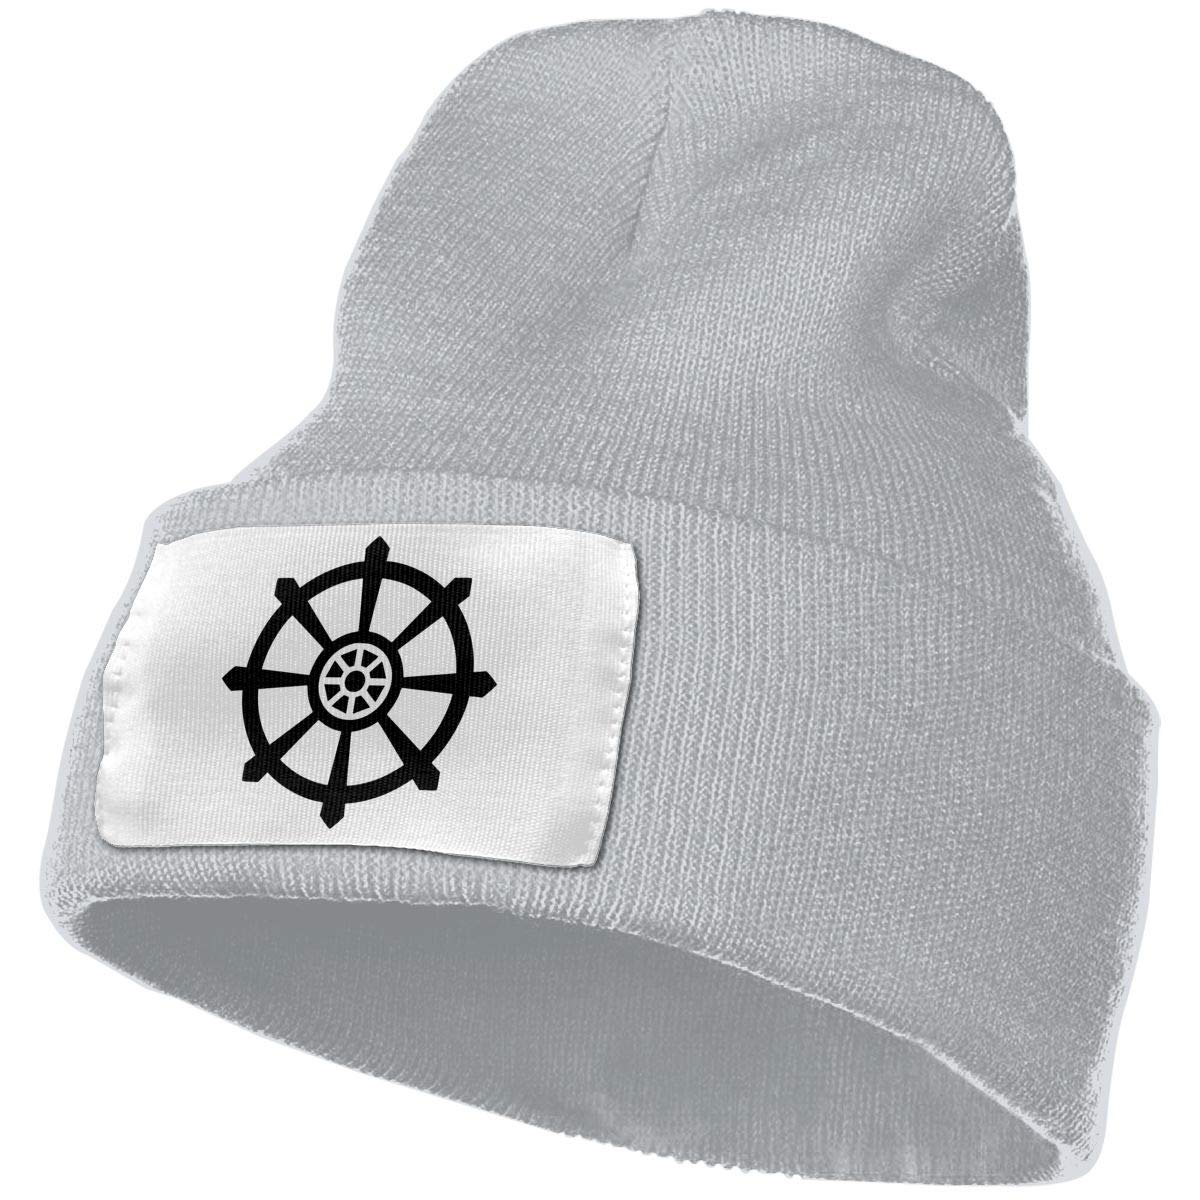 Dharmachakra Men/&Women Warm Winter Knit Plain Beanie Hat Skull Cap Acrylic Knit Cuff Hat